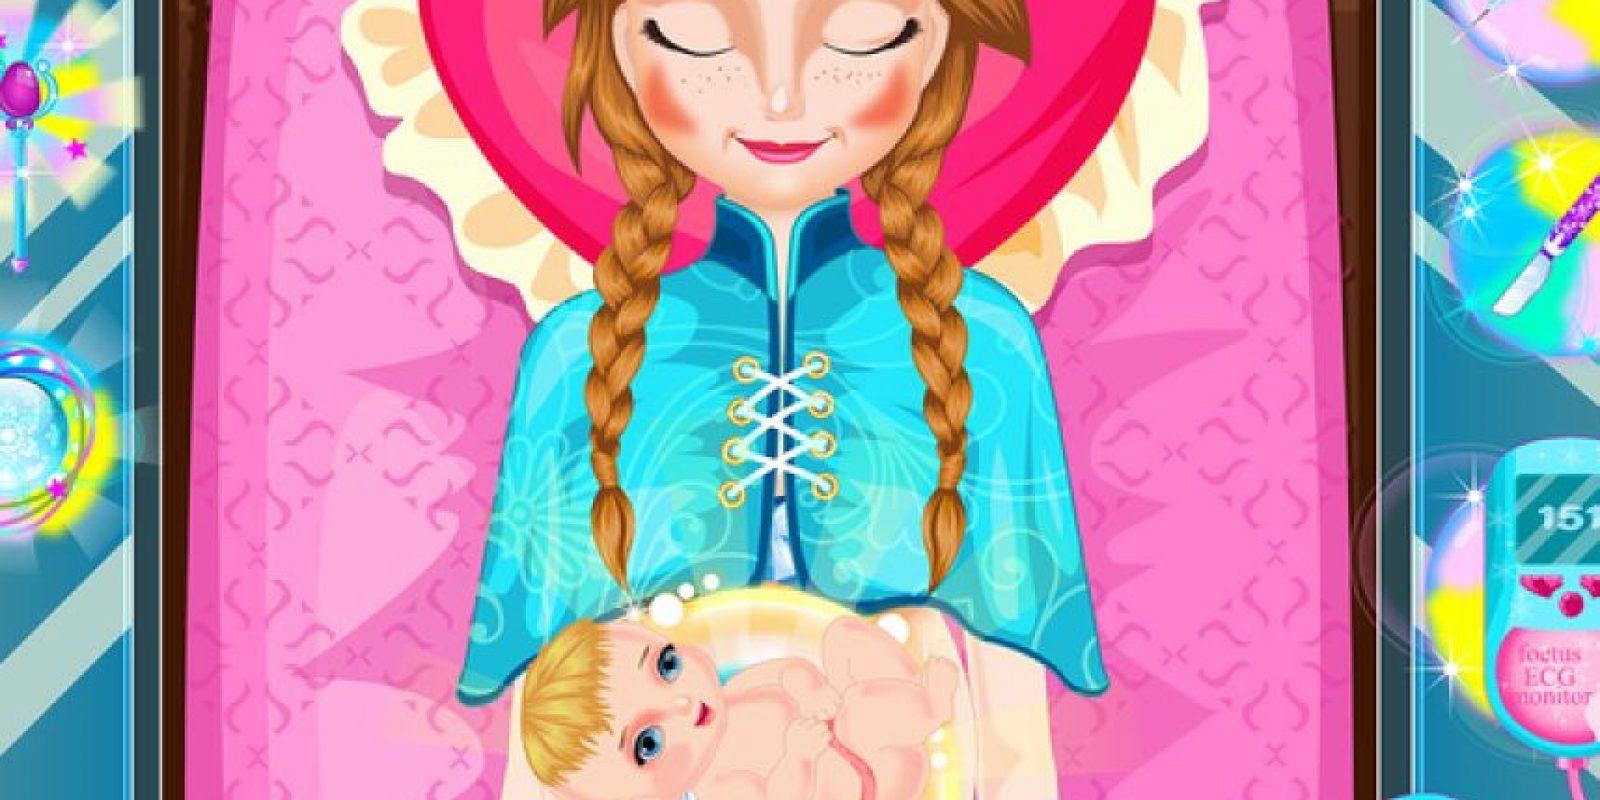 Anna en plena cirugia Foto:iTunes